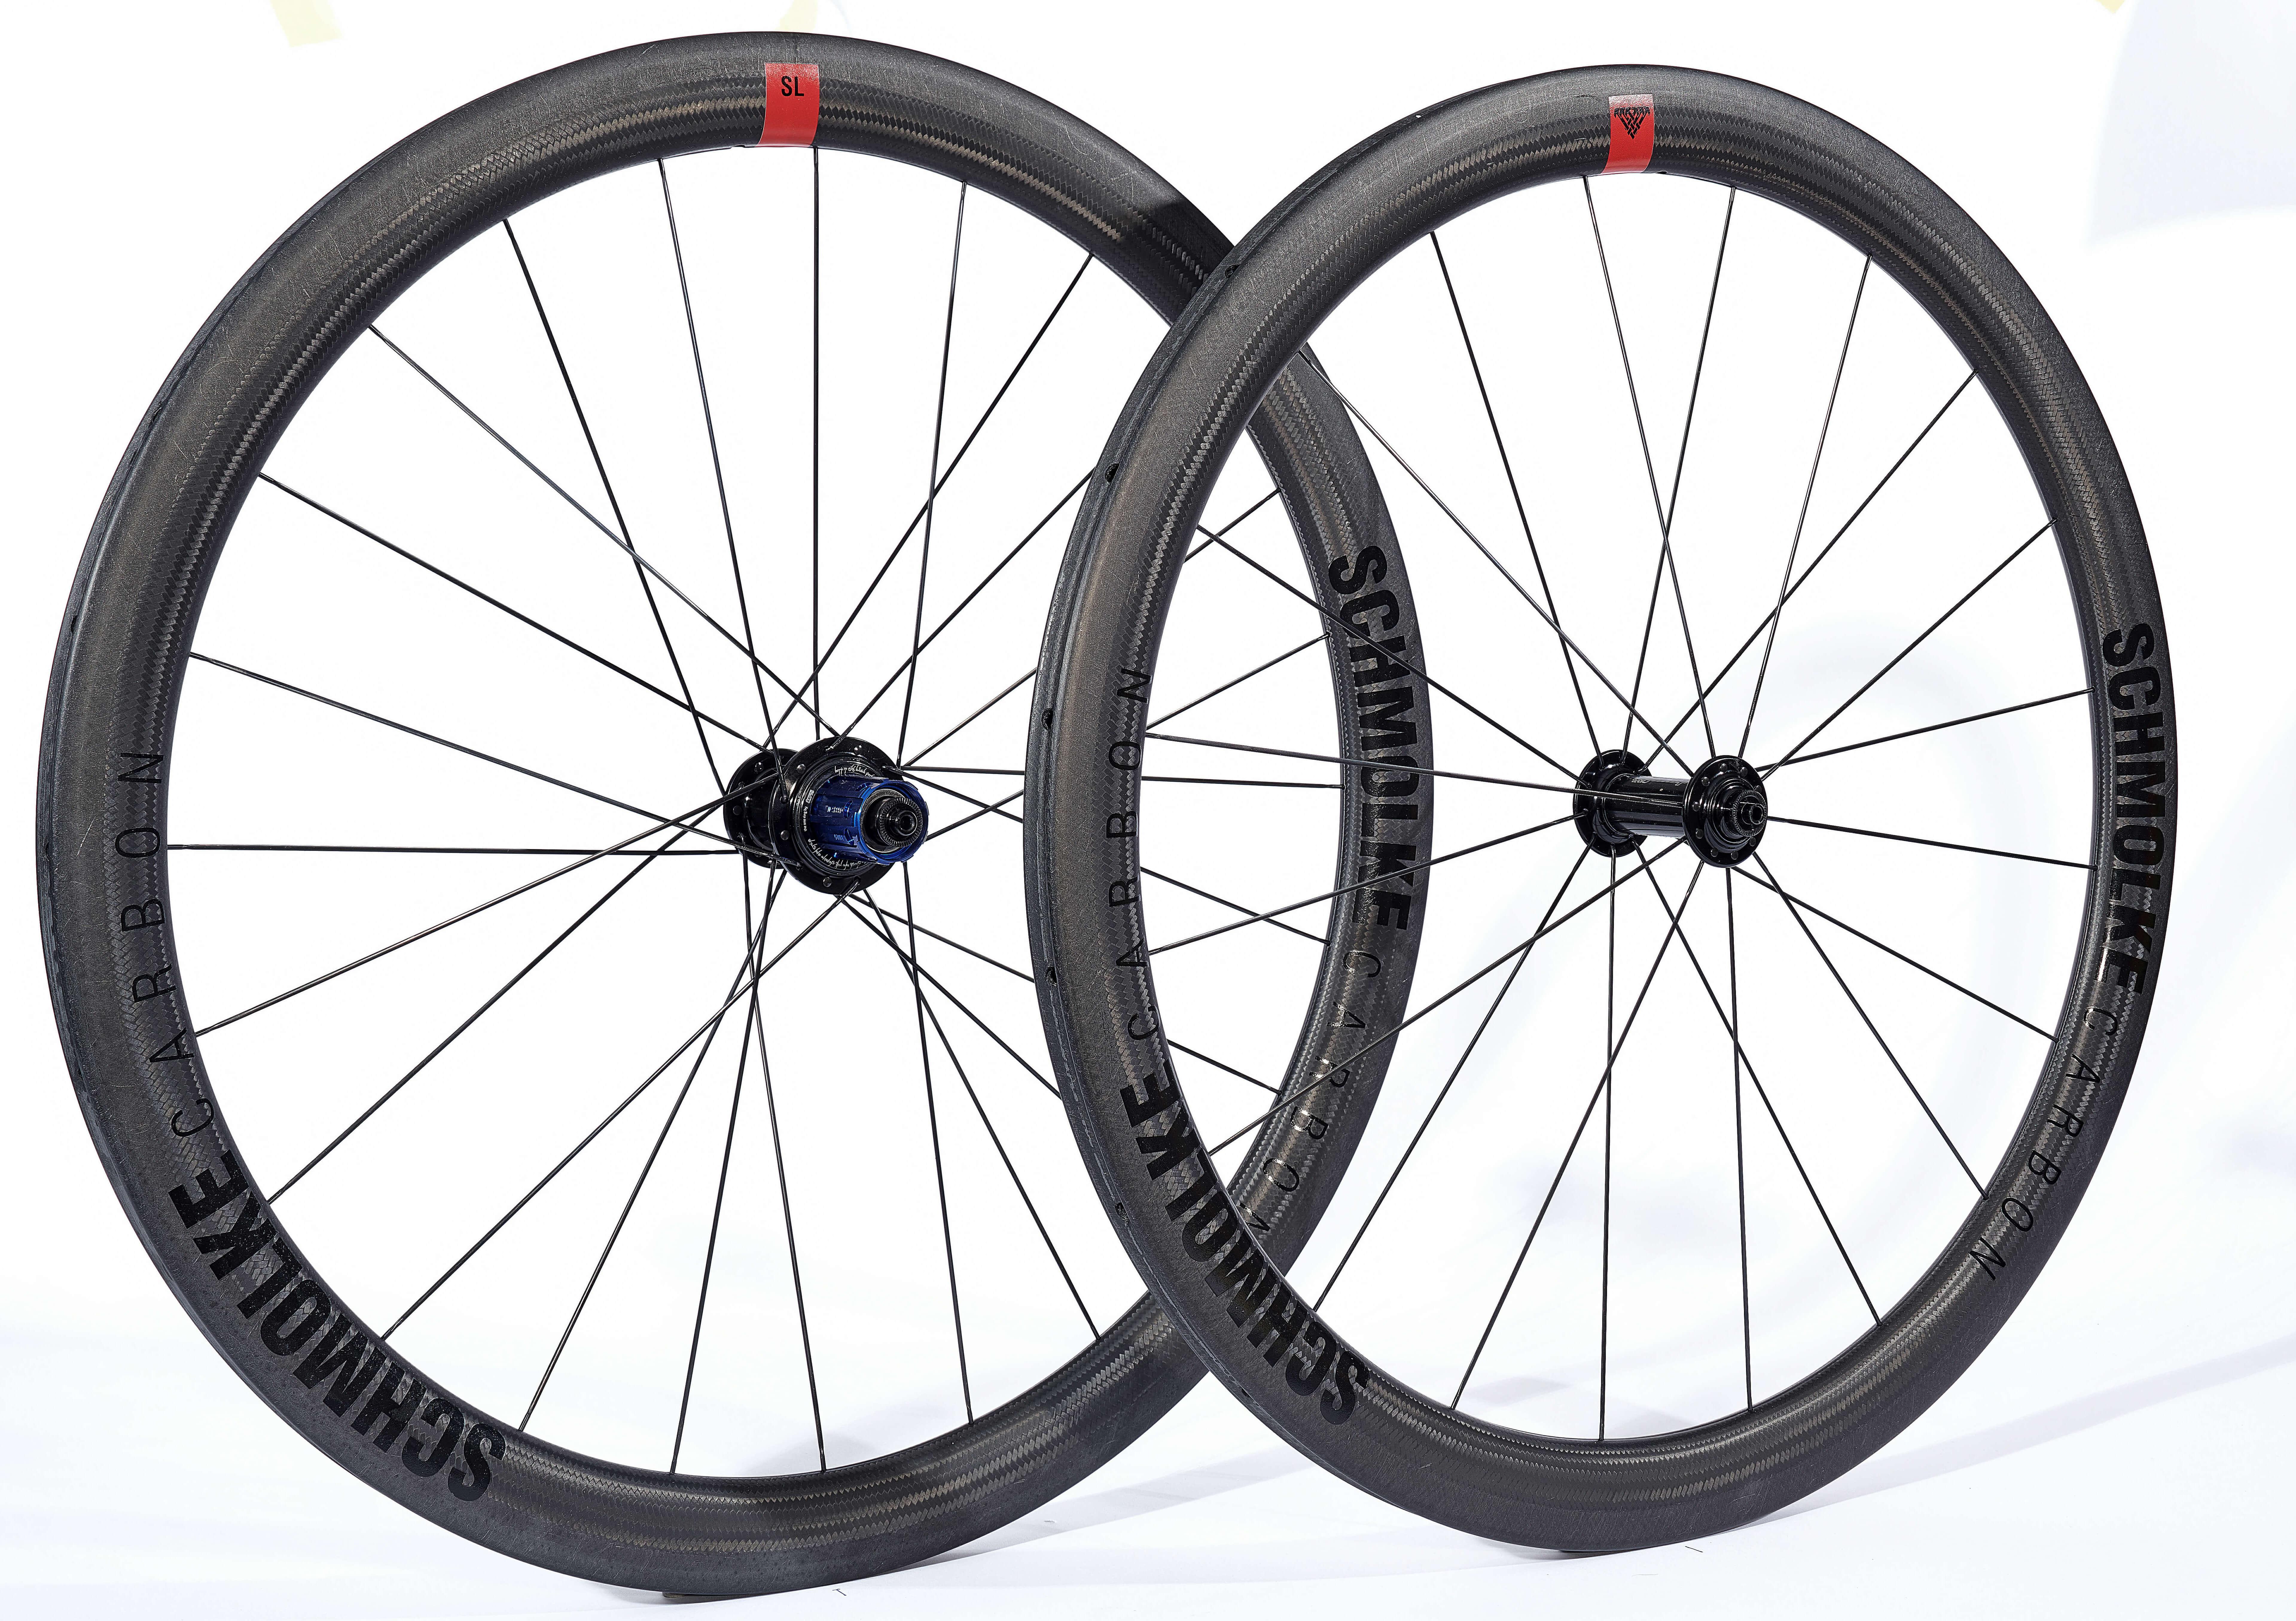 Schmolke Tubular SL 45mm wheelset with Tune mig70 mag 170 hubs